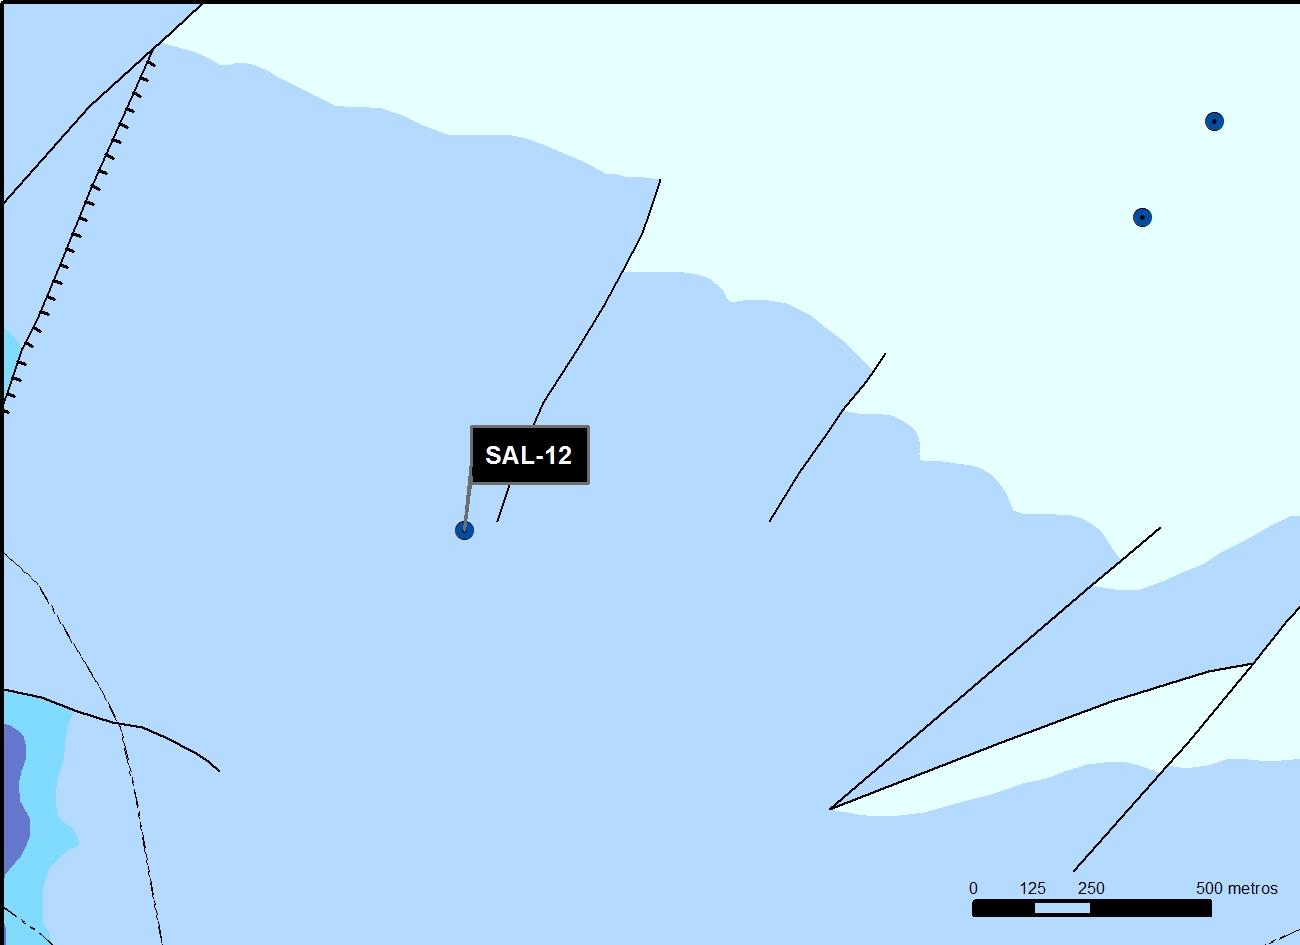 SAL_12_M.V.LOZANO_GAMELLONES DEL ALTO ALEGAS_MAP.GEOL